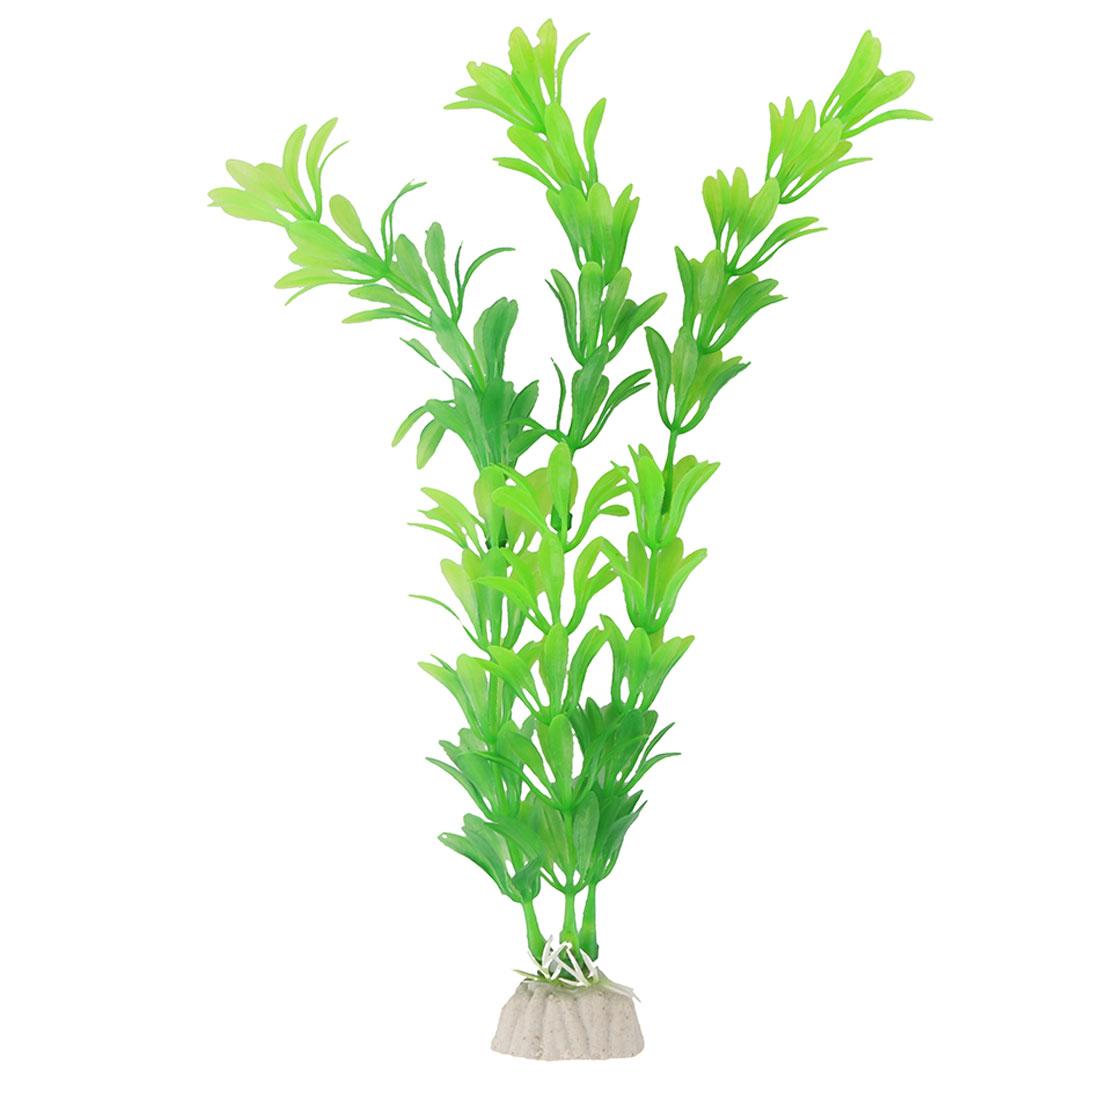 Aquarium Plastic Emulational Artificial Plant Grass Decoration Green 22cm Height